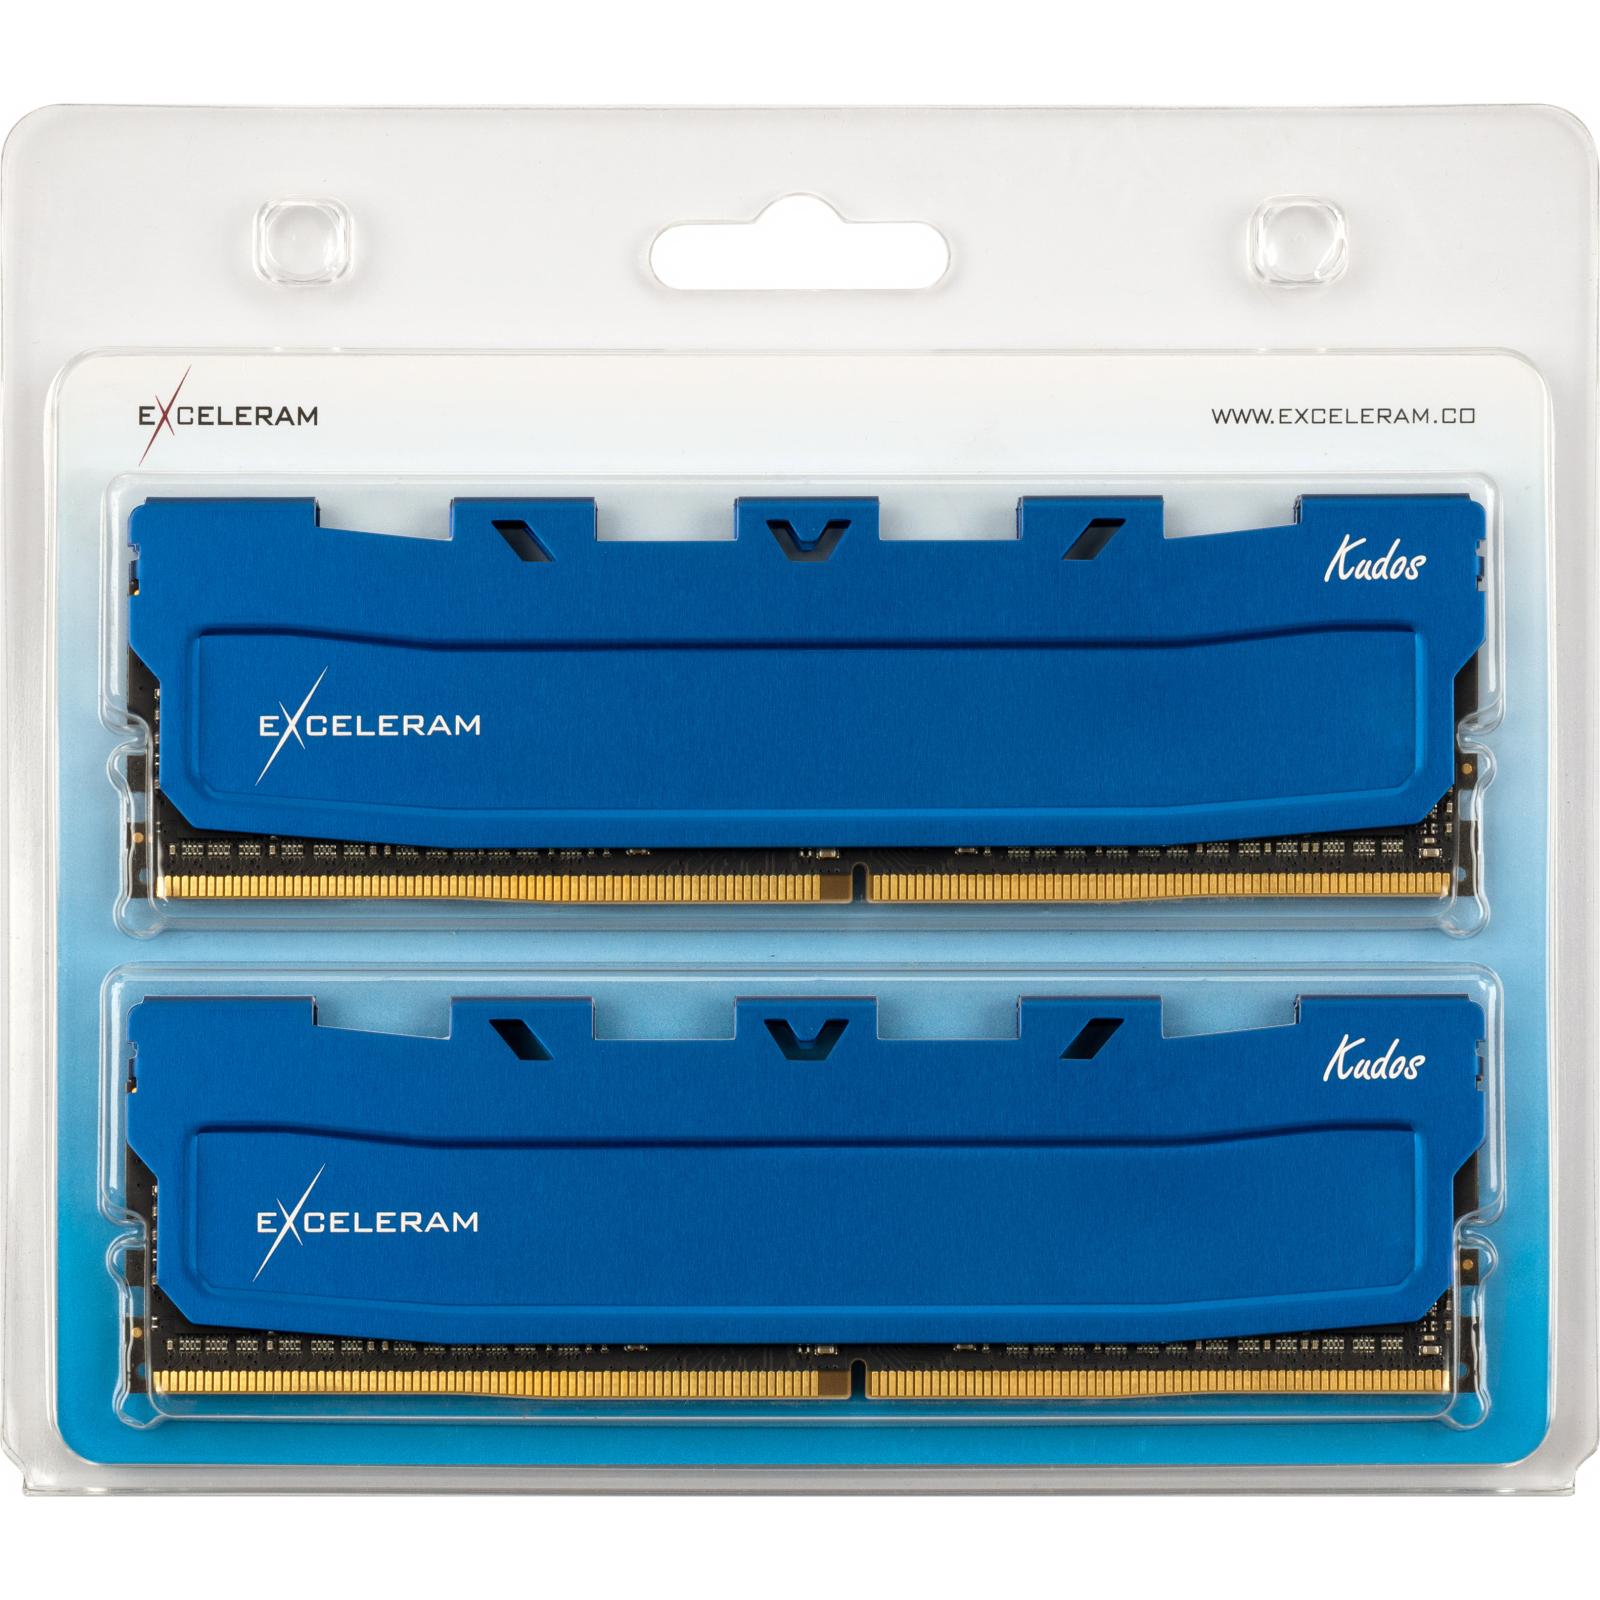 Модуль памяти для компьютера DDR4 32GB (2x16GB) 2666 MHz Kudos Blue eXceleram (EKBLUE4322619AD) изображение 2